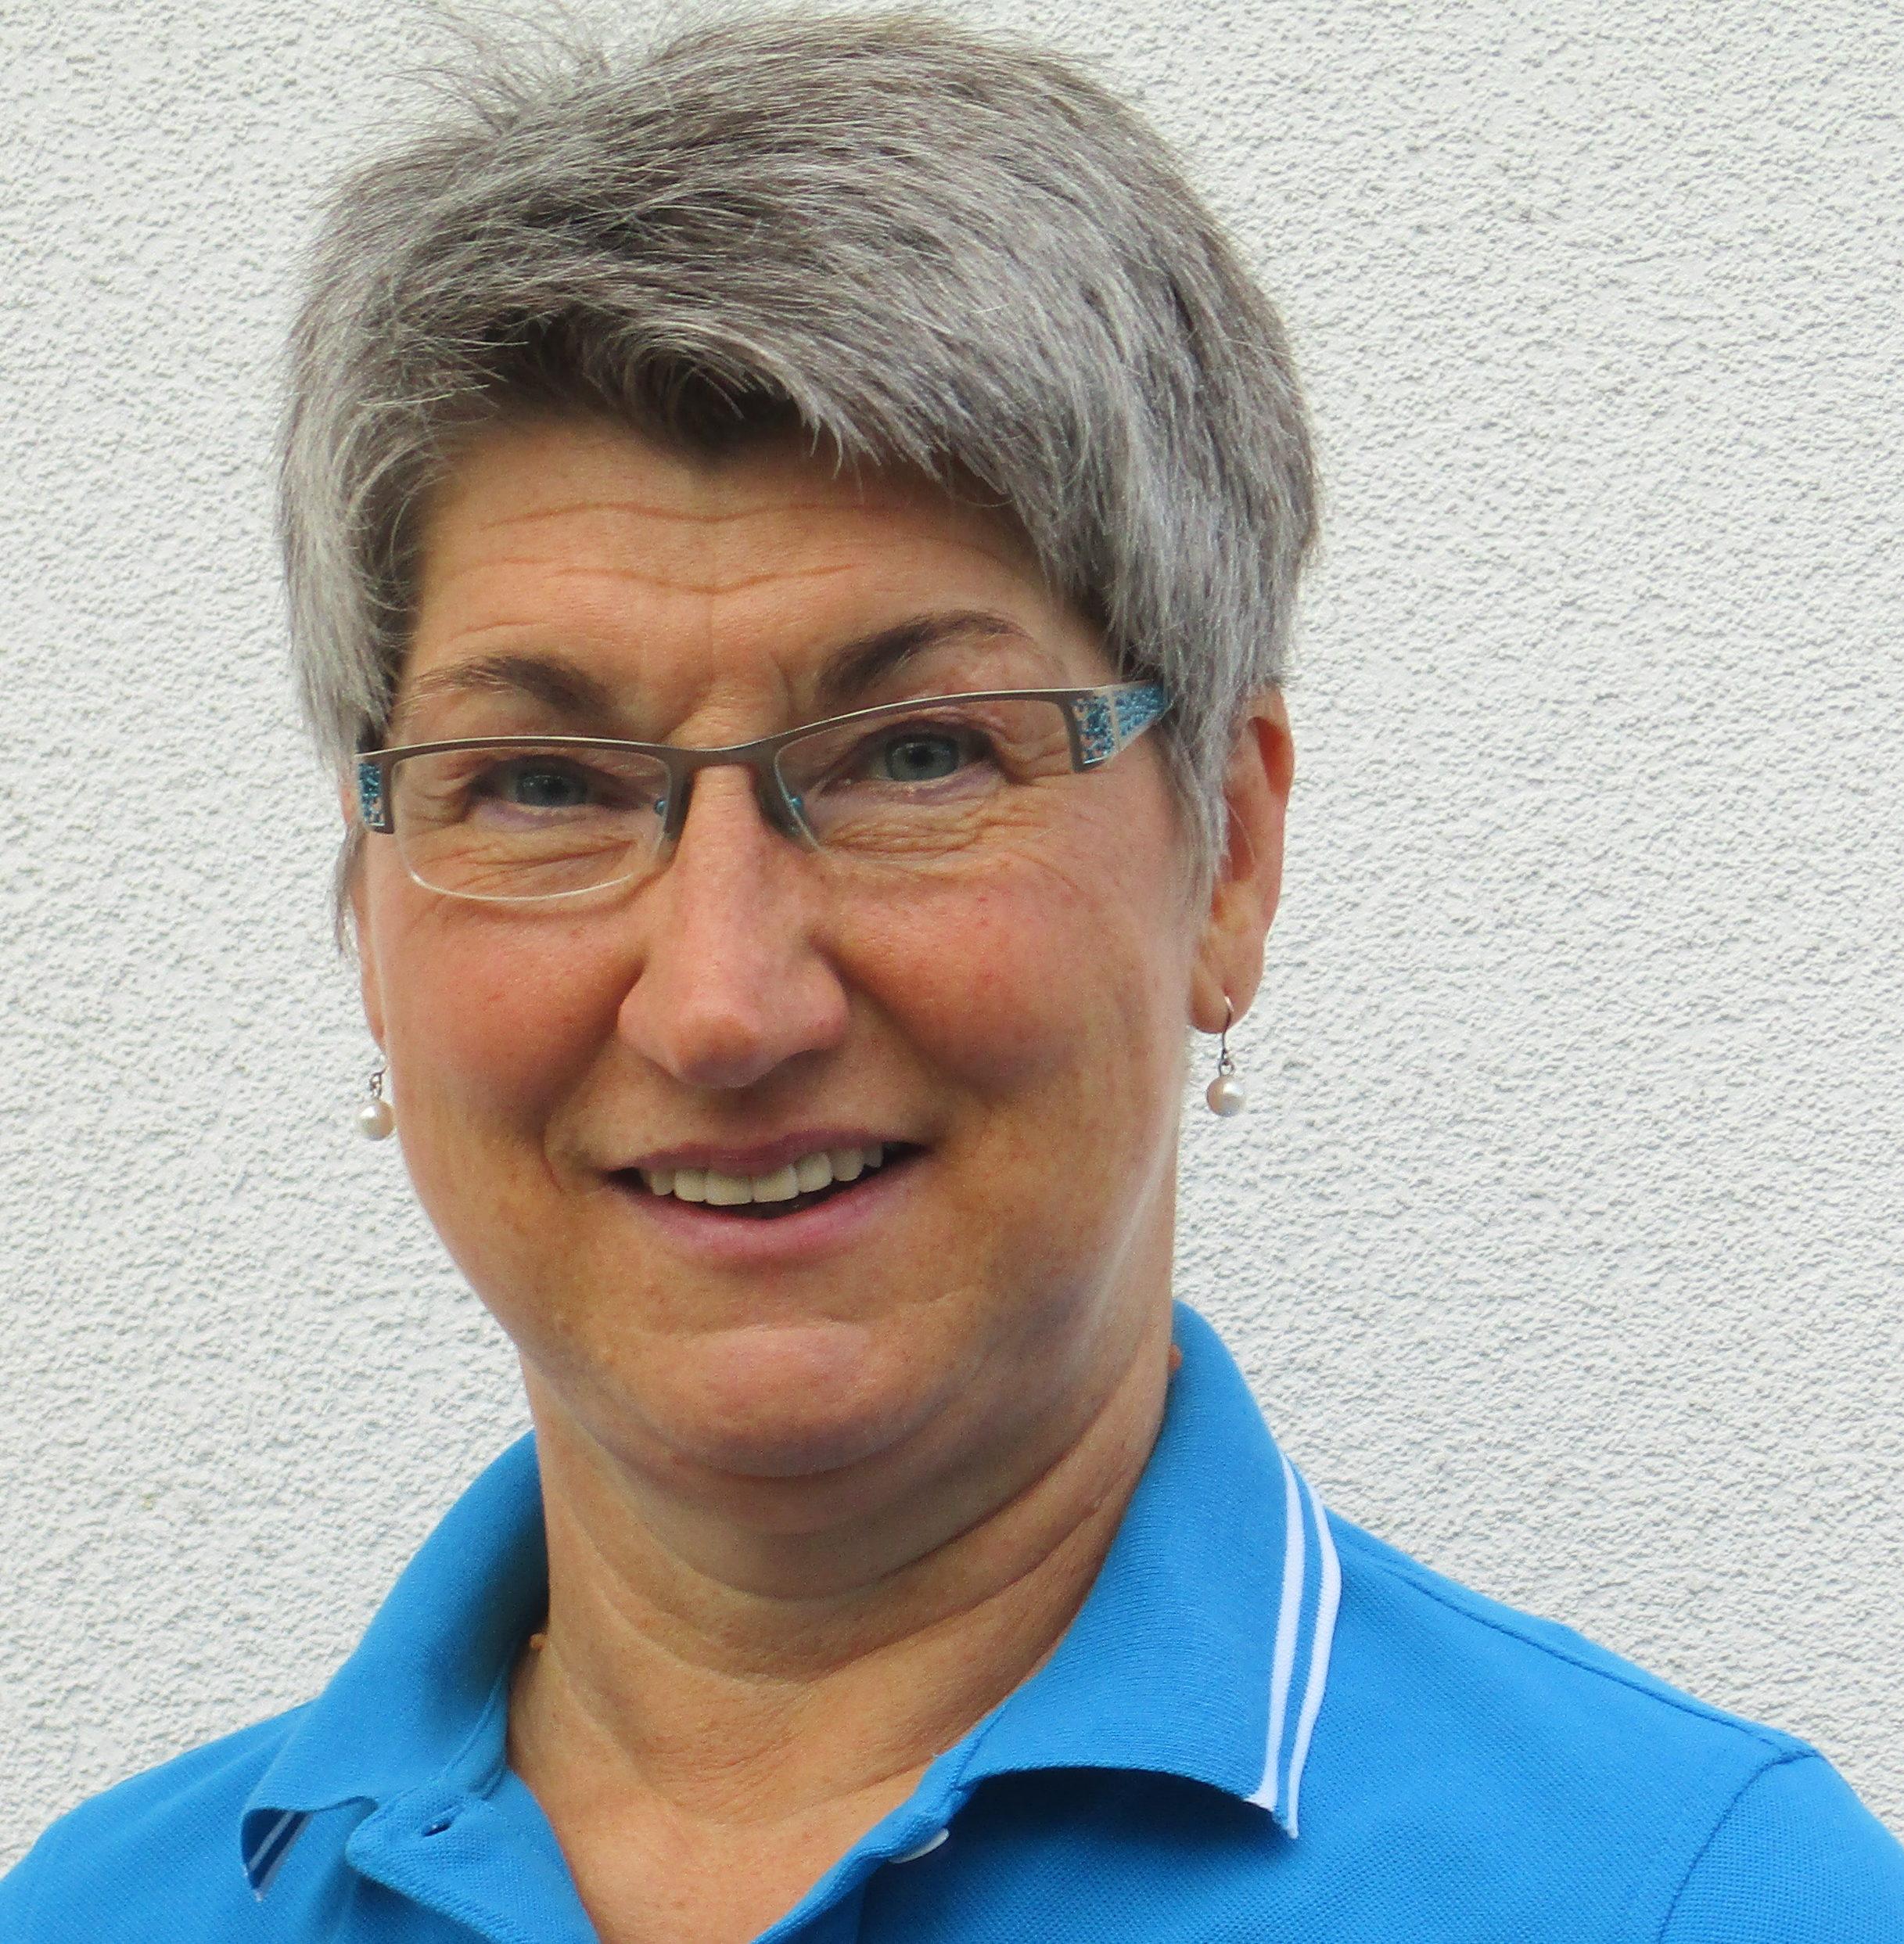 Birgit Nahr